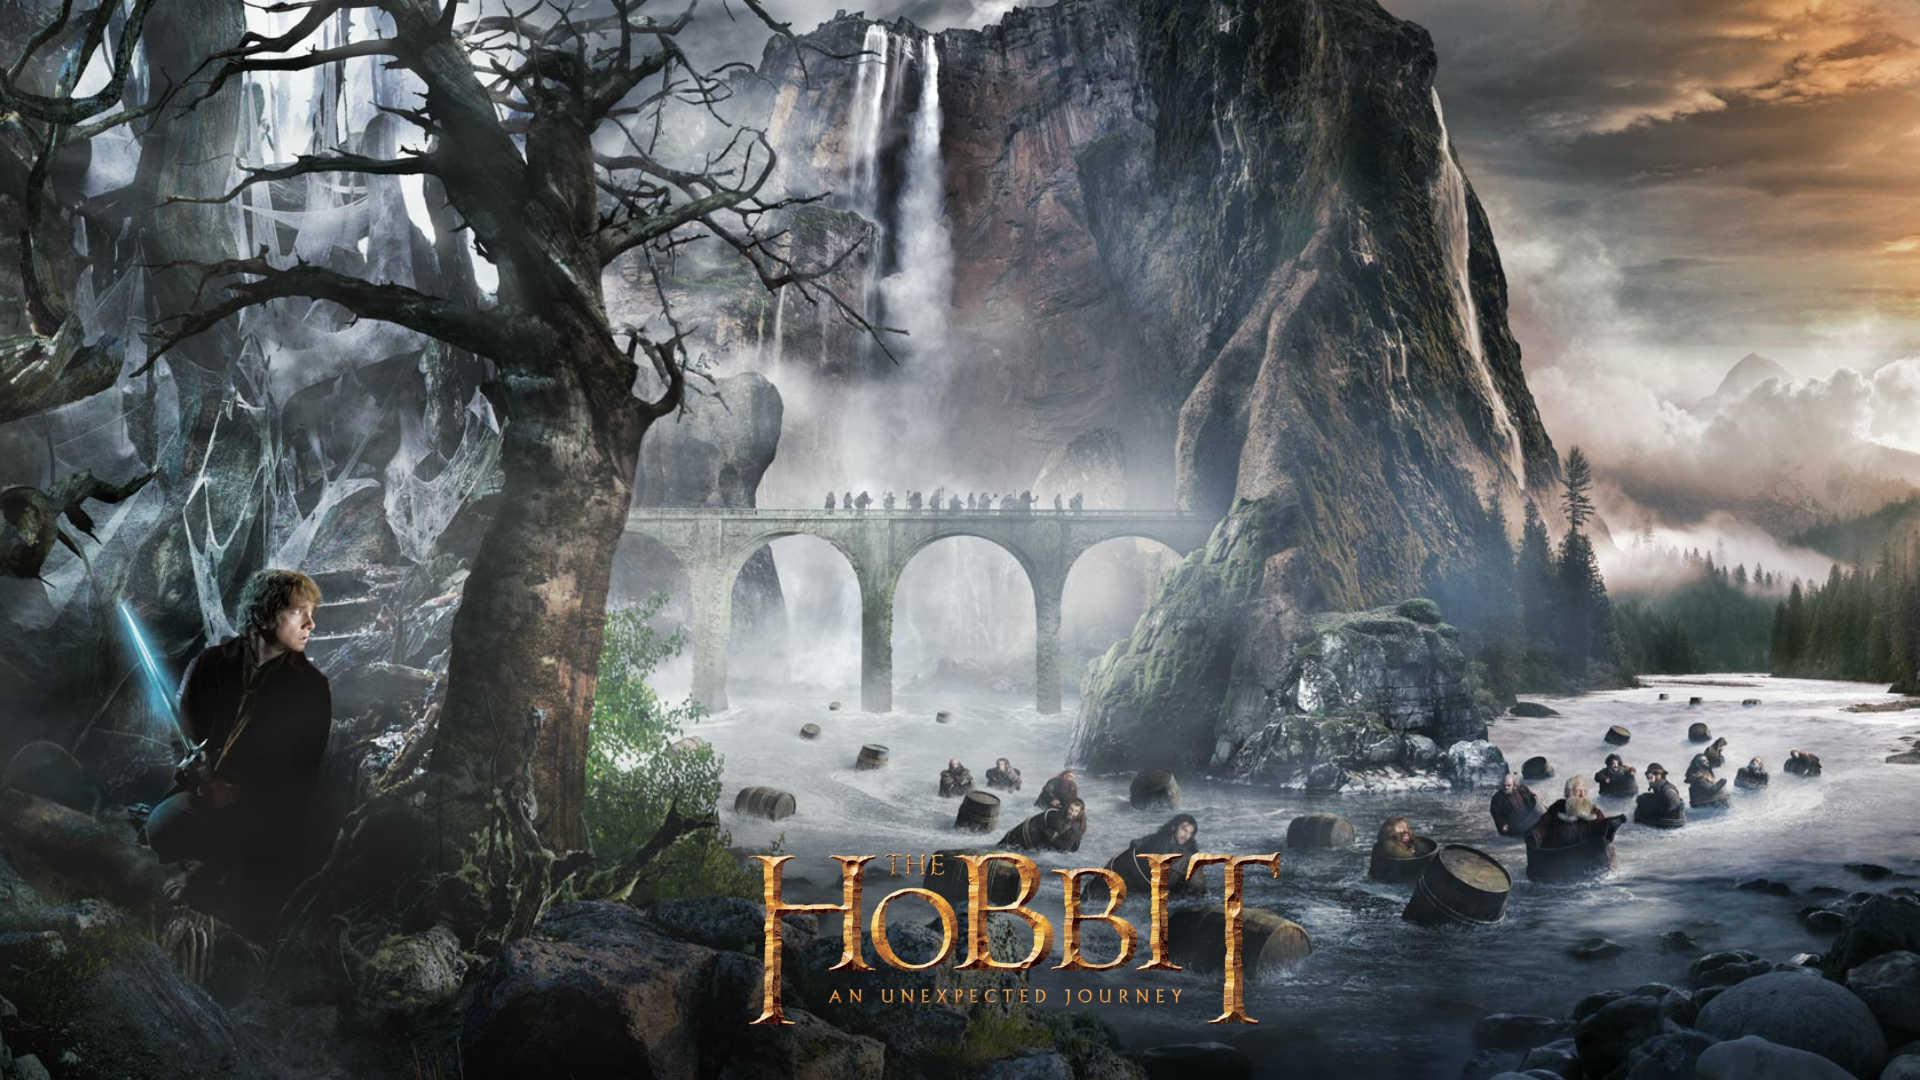 The Hobbit Wallpaper   The Hobbit Wallpaper 33042230 1920x1080